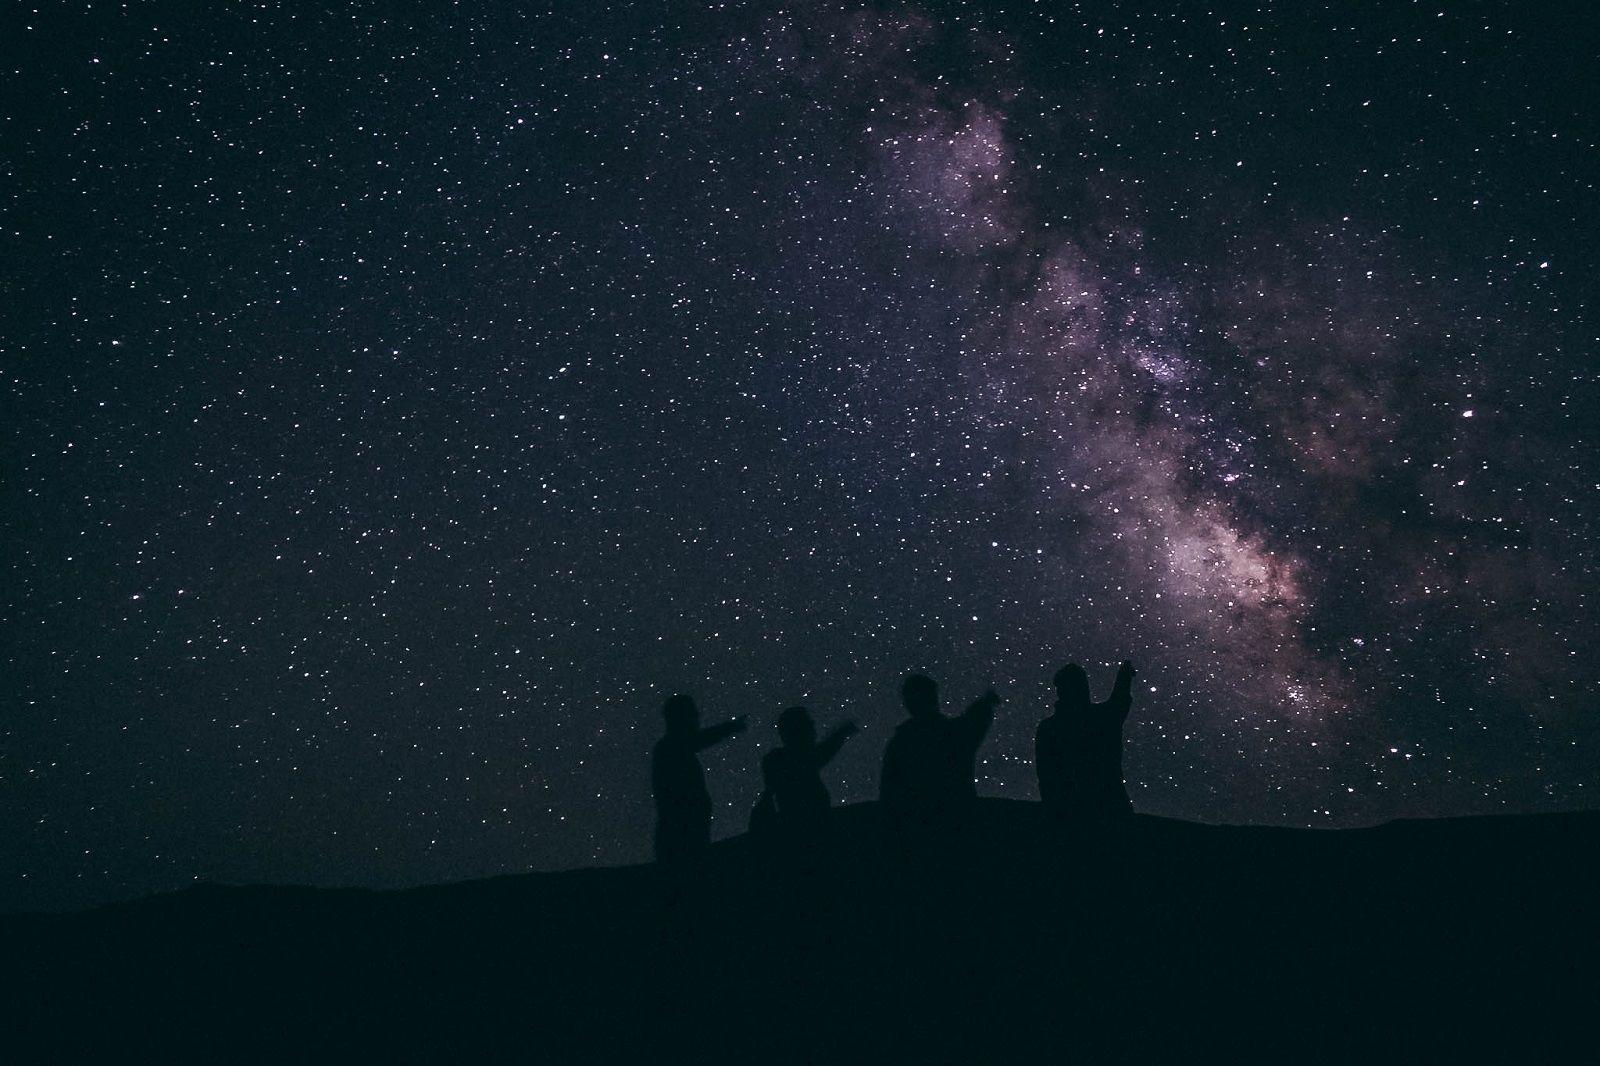 Kyrgyzstan, Song Kul, Starry night